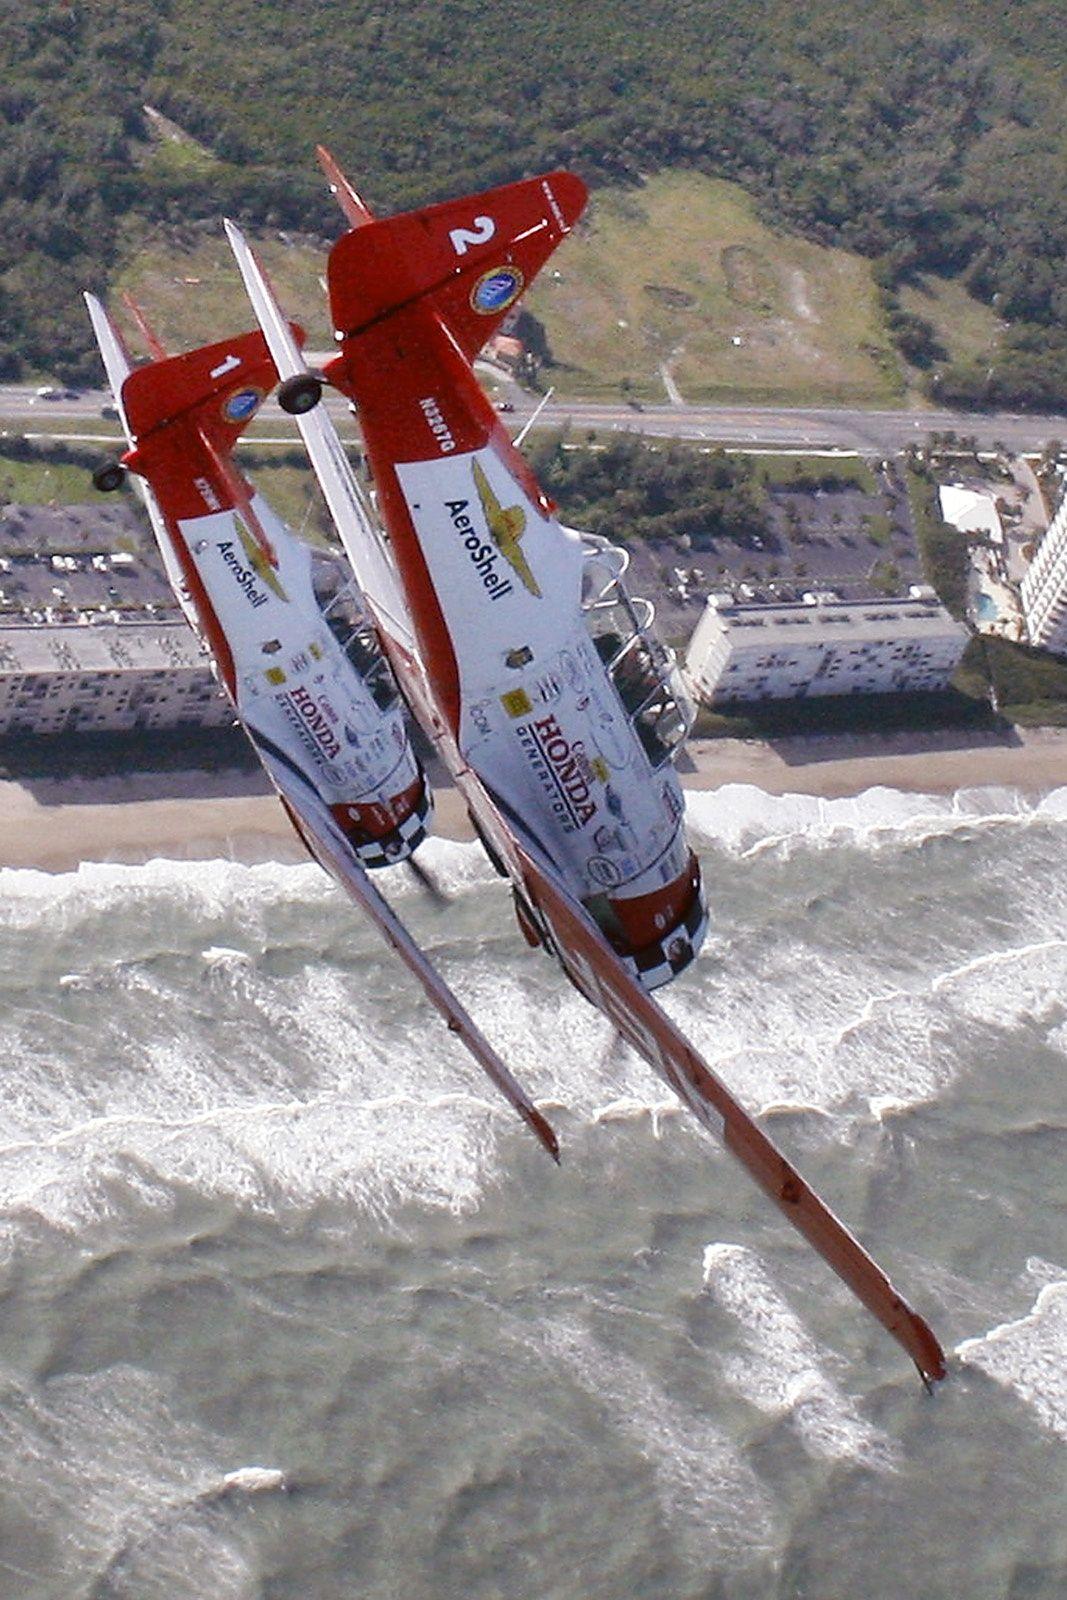 Aeroshell Stunt Team by Mitch Kloorfain on 500px, Florida